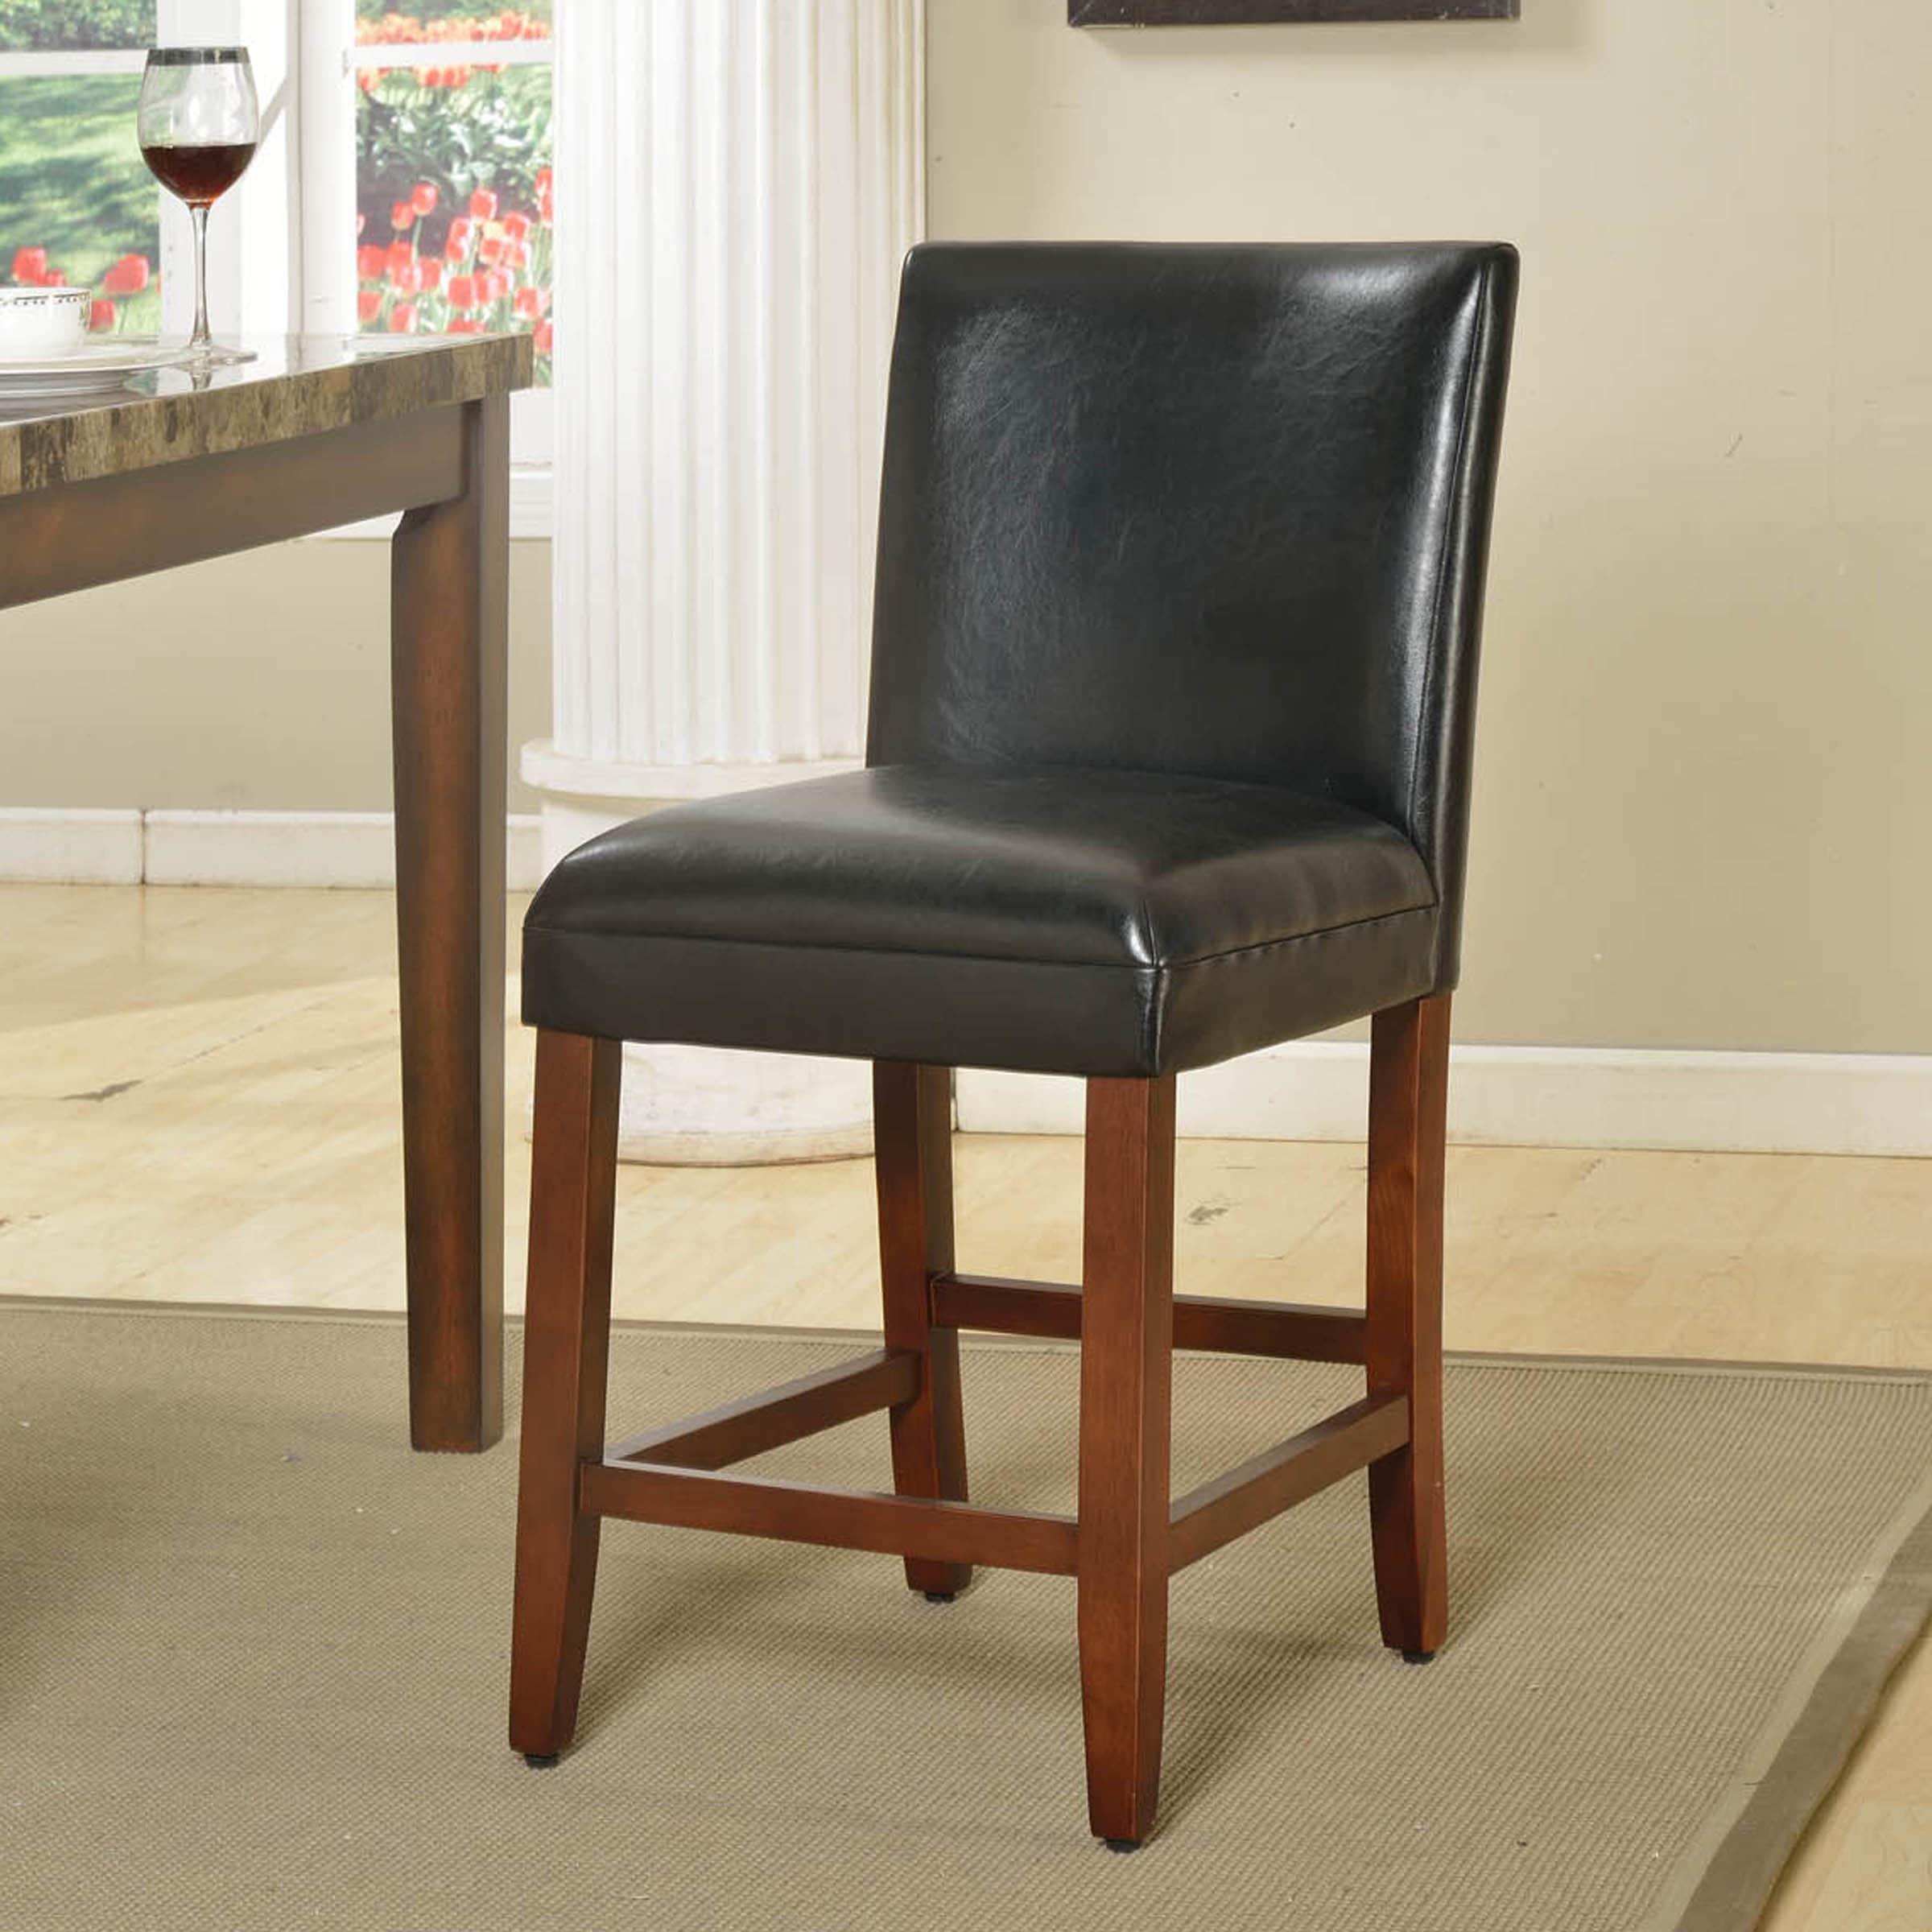 Remarkable Homepop 24 Inch Luxury Black Faux Leather Barstool Evergreenethics Interior Chair Design Evergreenethicsorg